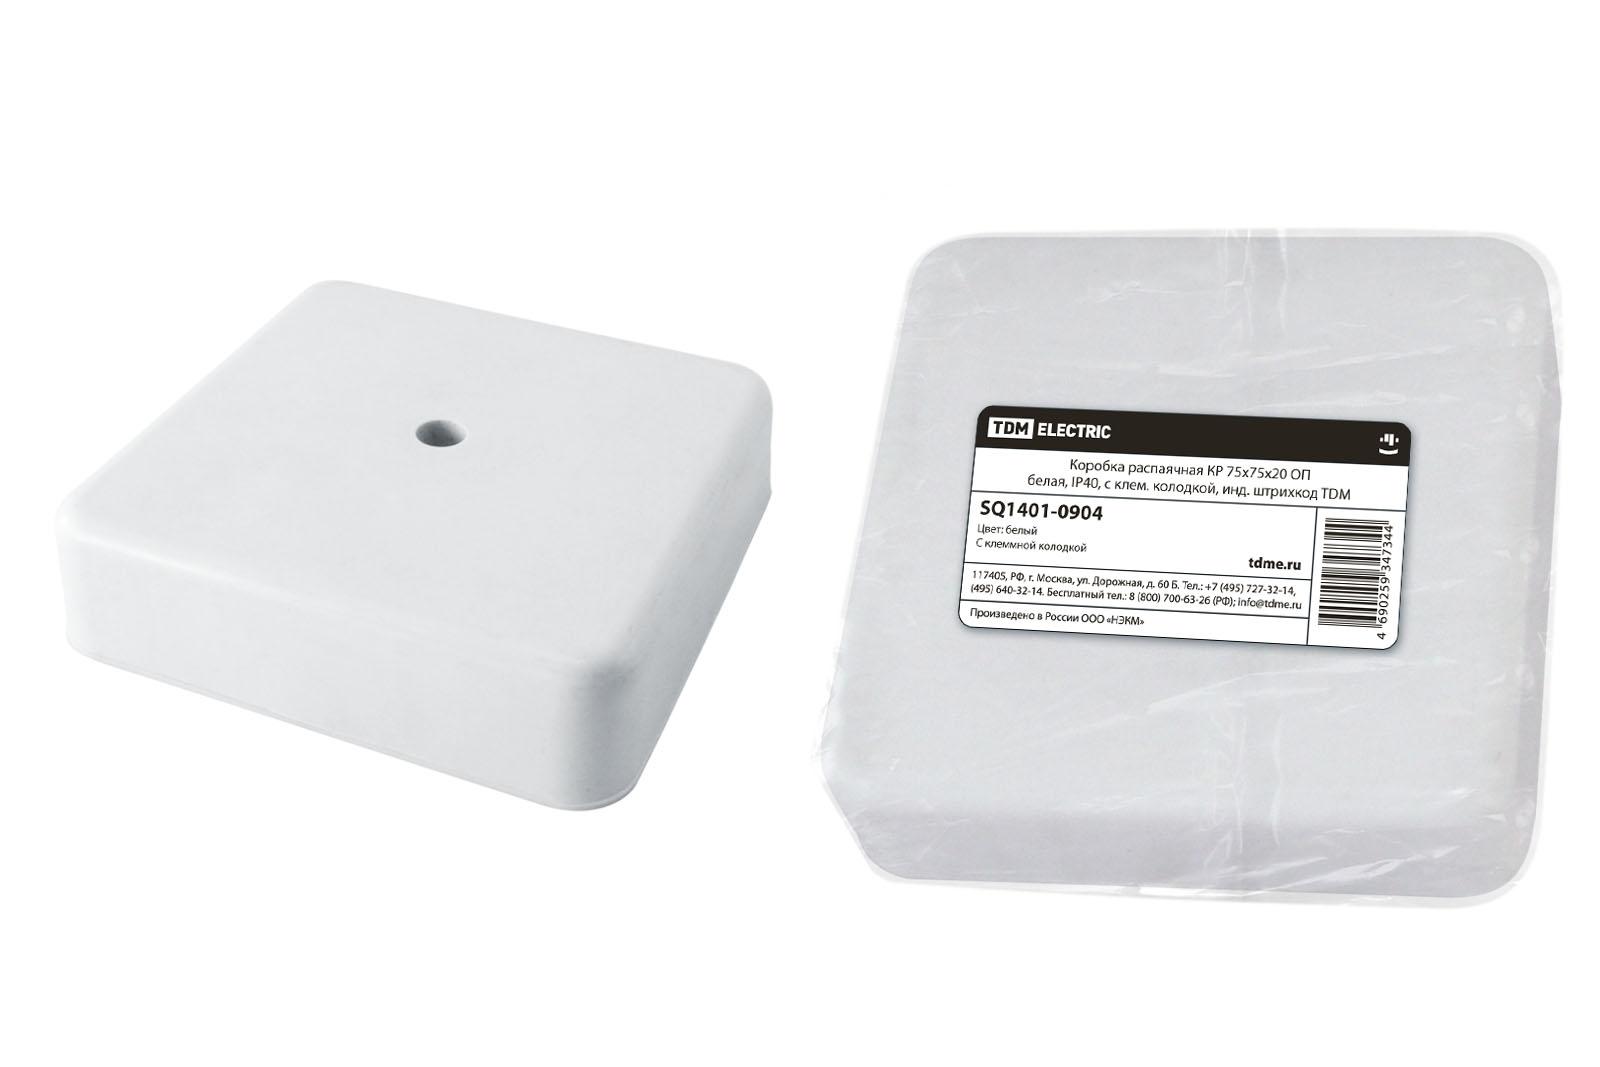 Фото Коробка распаячная КР 75х75х20 ОП белая, IP40, с клем. колодкой, инд. штрихкод TDM {SQ1401-0904}